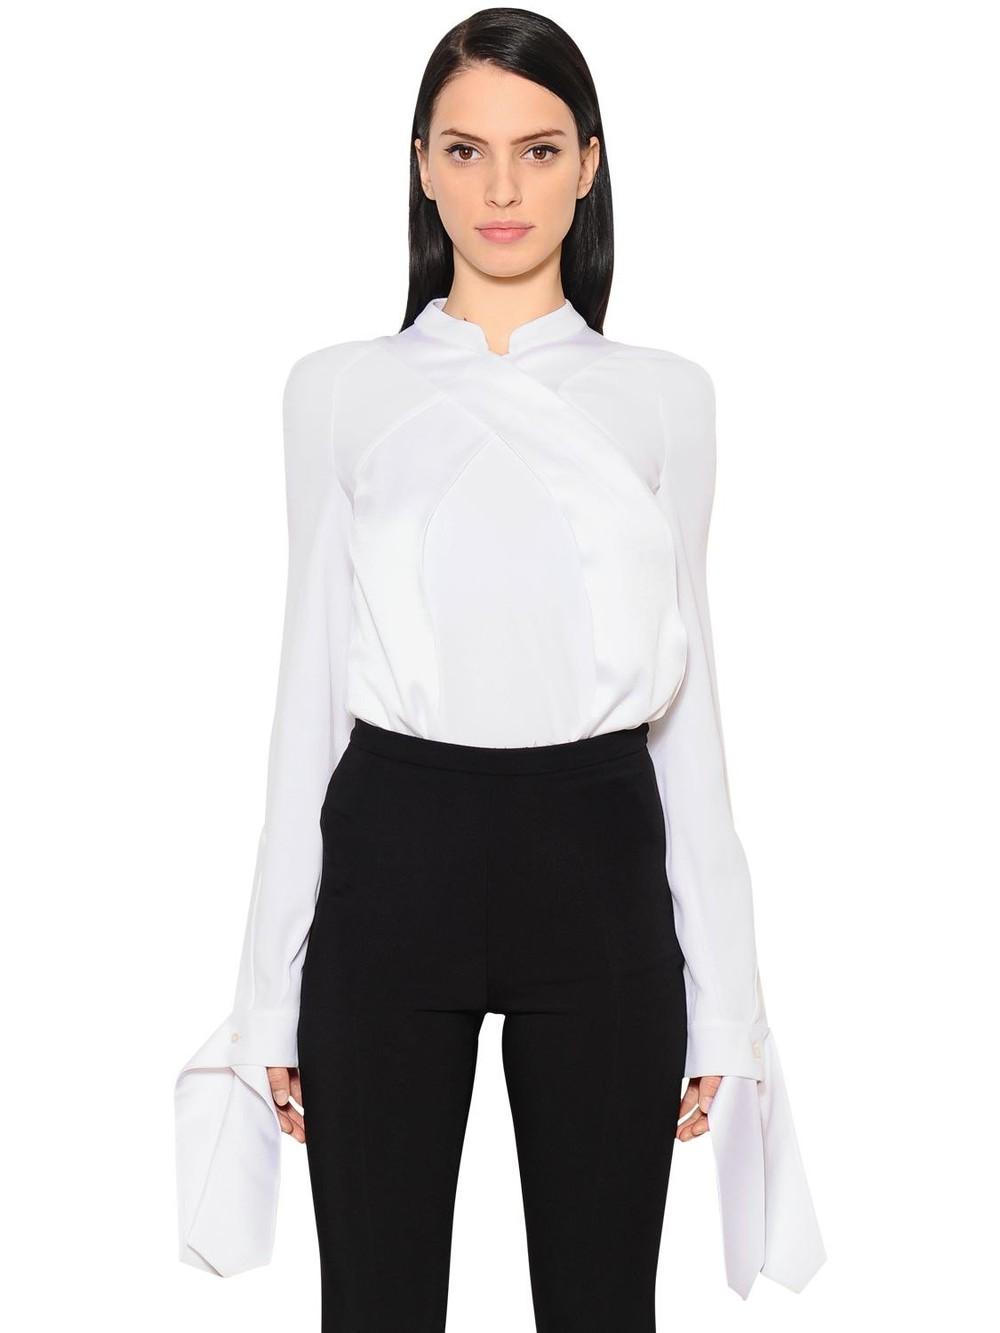 ANTONIO BERARDI Crossover Envers Satin Shirt in white